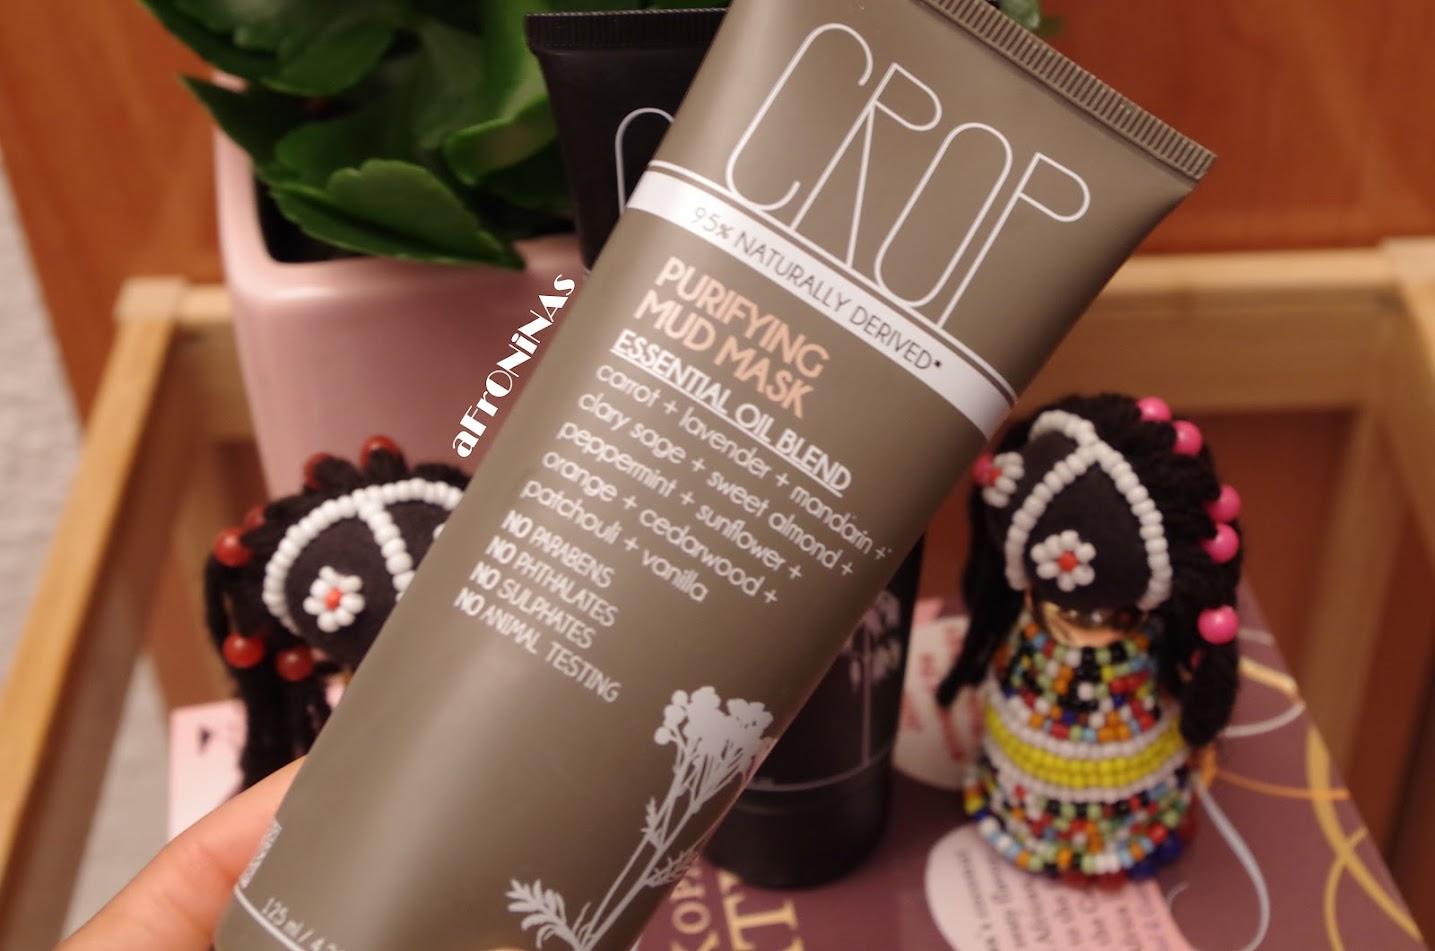 rutina facial con productos naturales, cosmética natural facial, cuidado piel cara natural